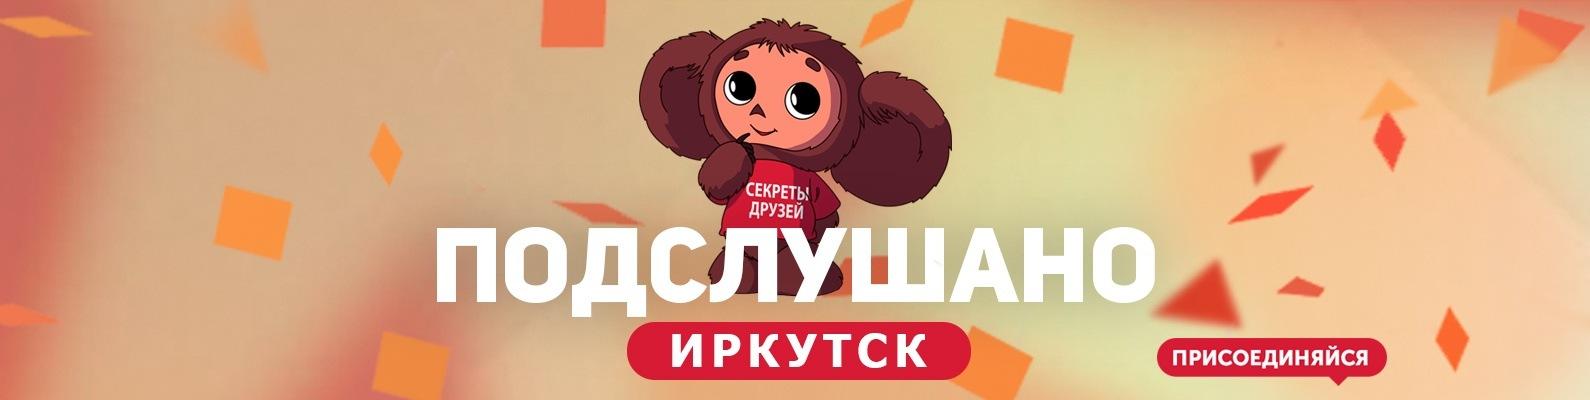 Девочки из иркутска для секса